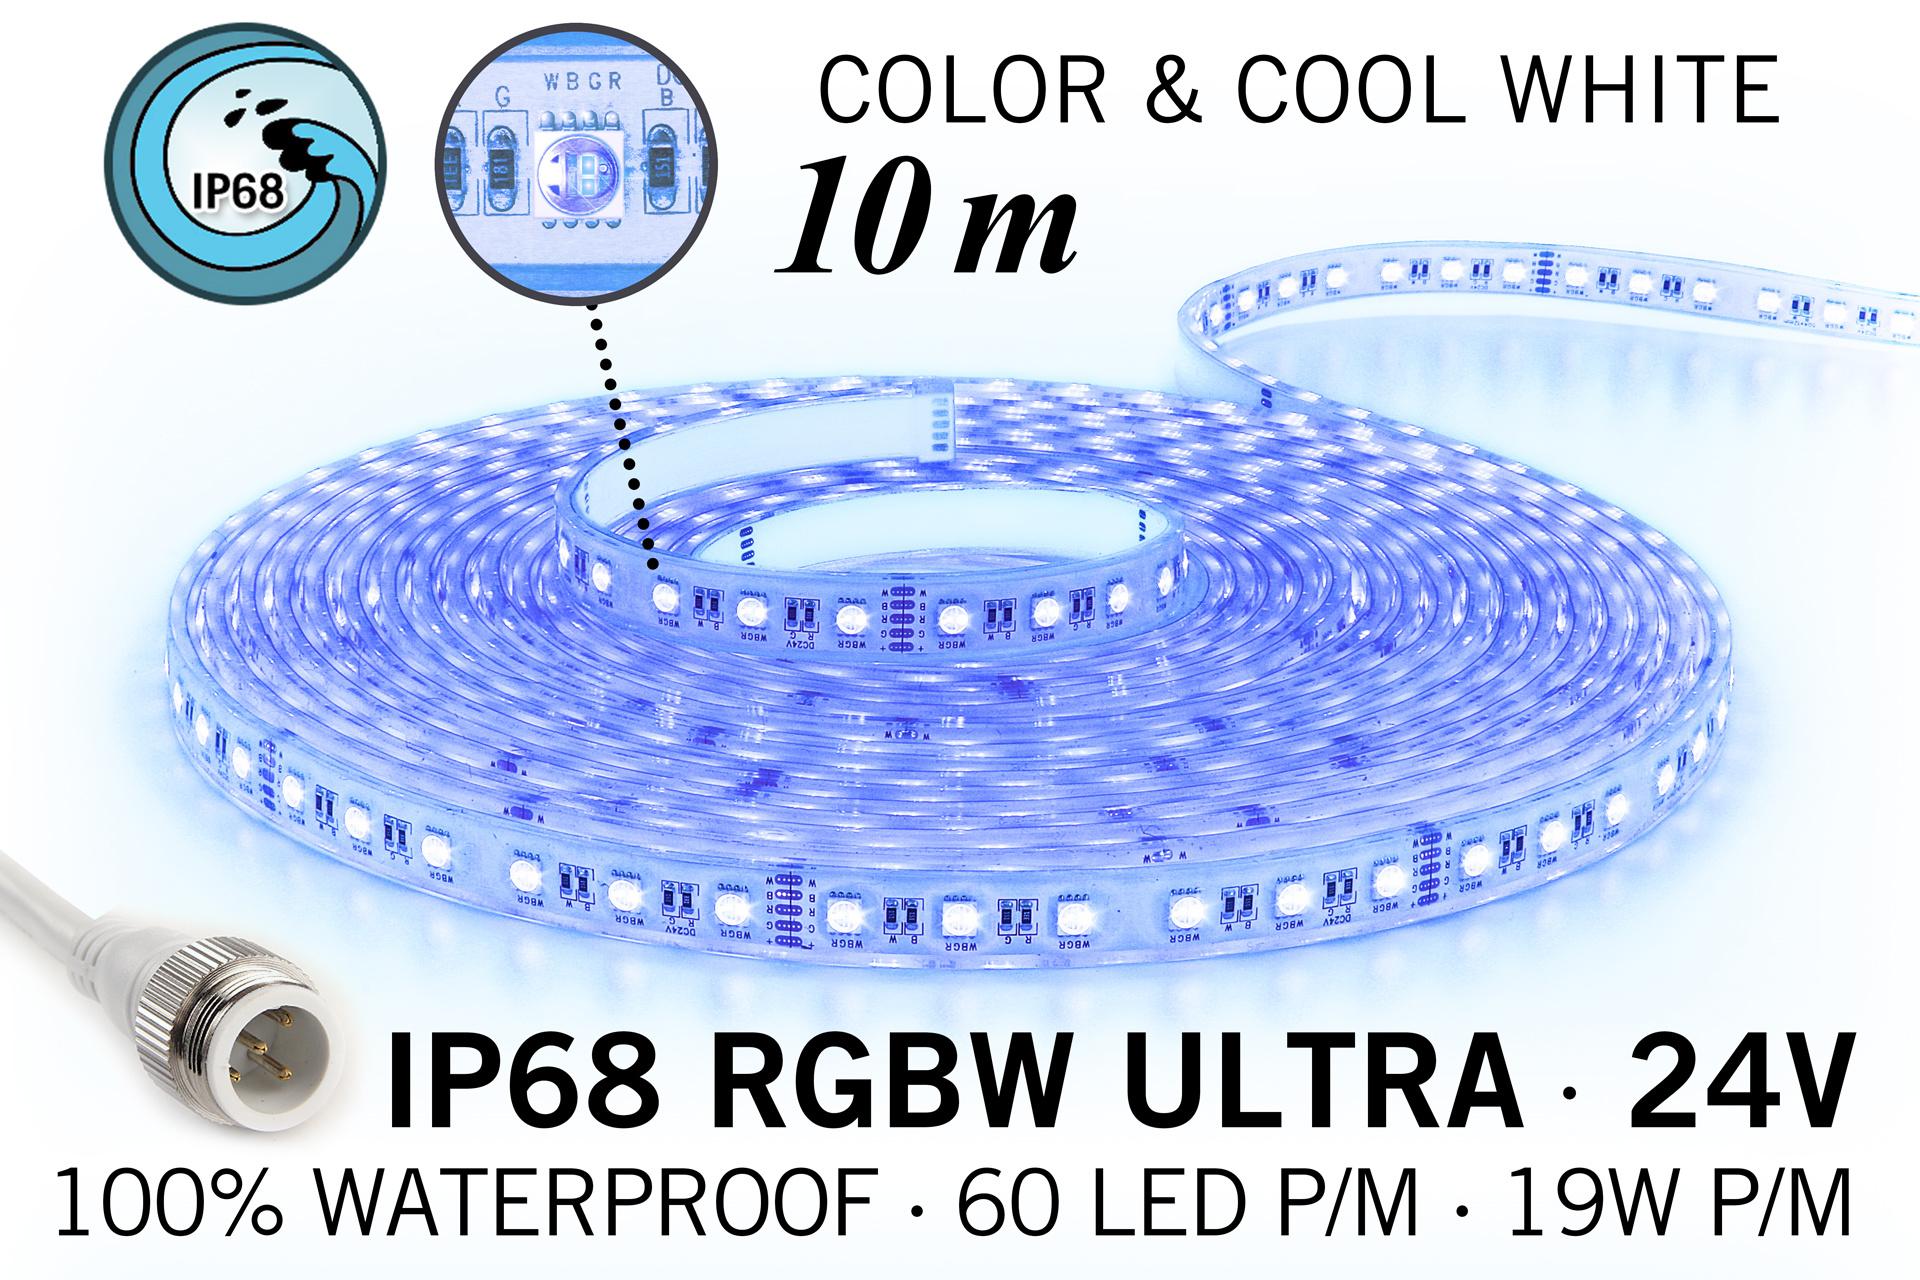 AppLamp IP68 Waterdichte RGBW ULTRA Ledstrip, RGB+Koel wit, 60 led's p/m, 24 Volt, 10 meter